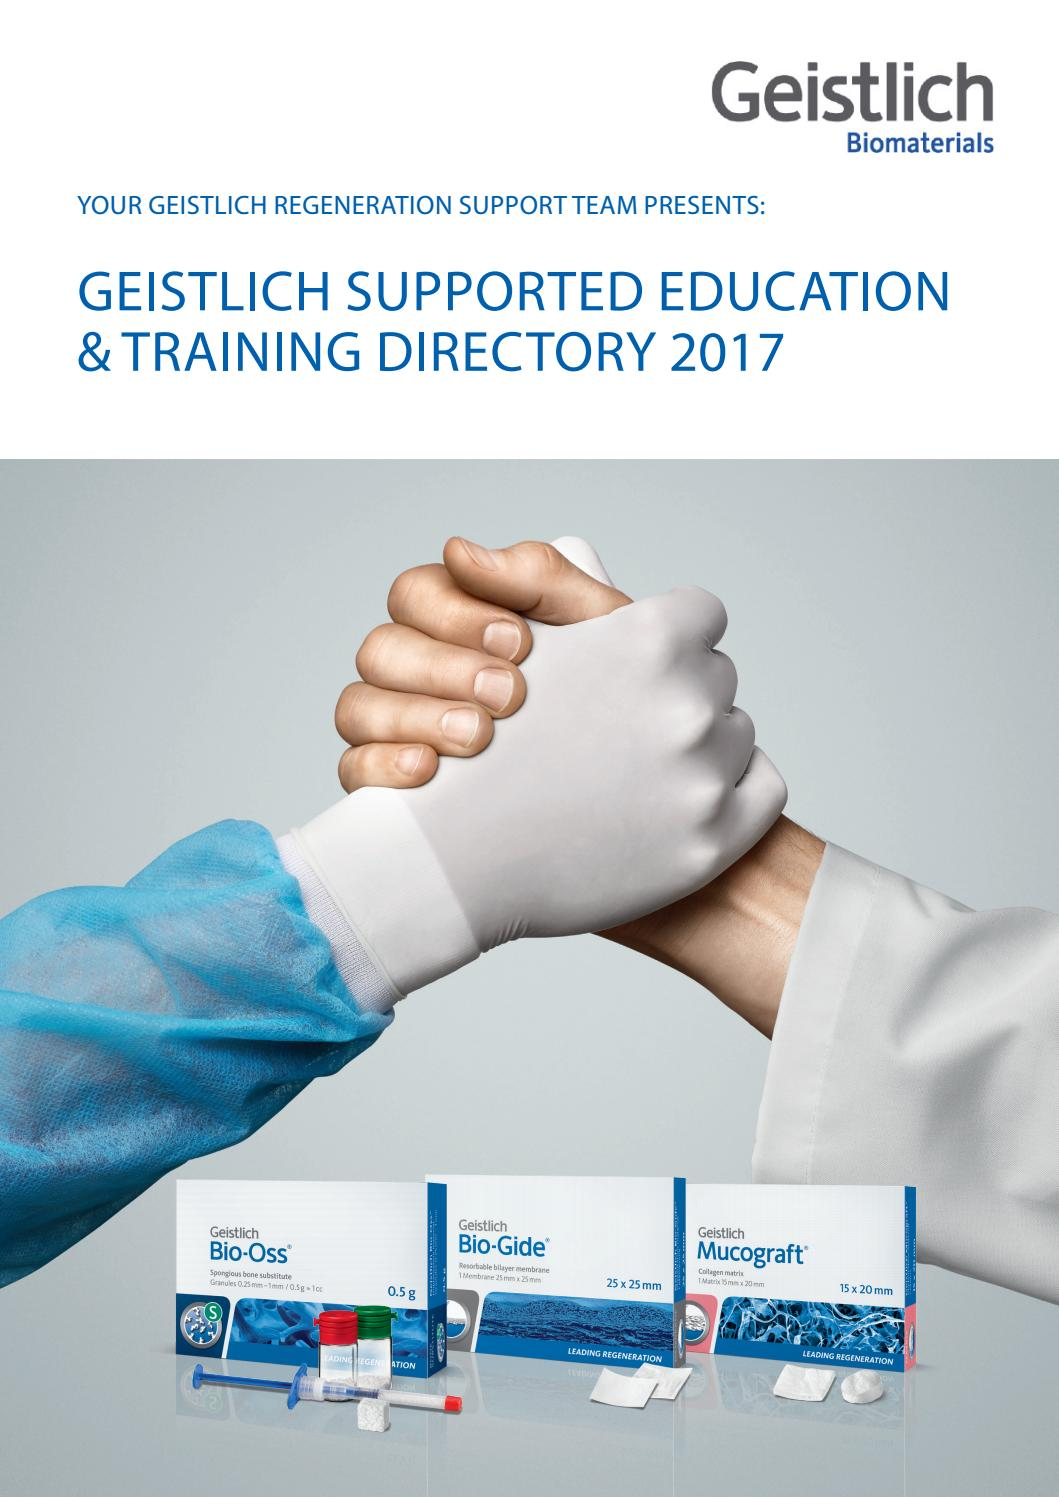 Geistlich Course Directory - April 2017 by Geistlich_Pharma - issuu